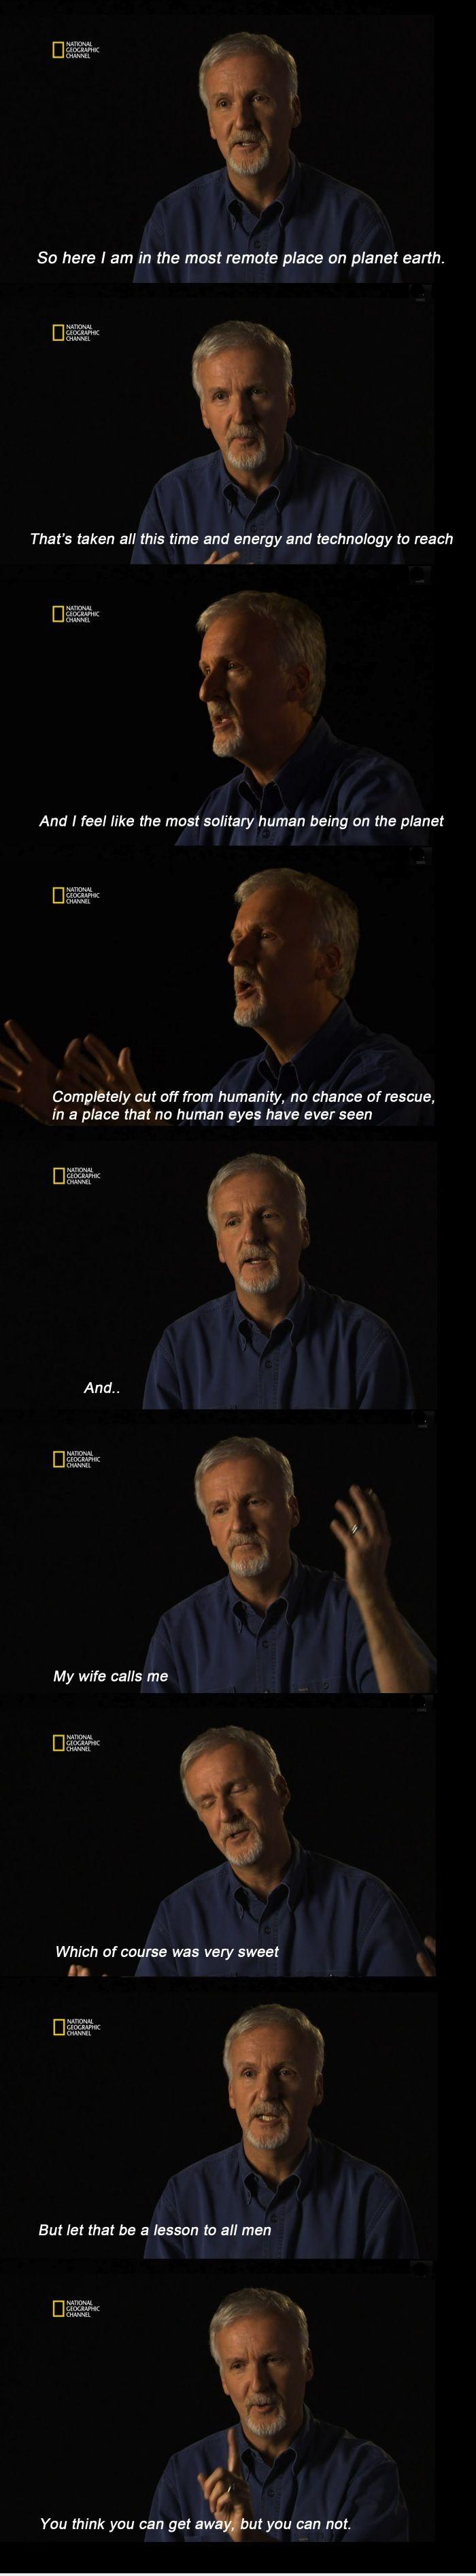 James Cameron on women.... true words